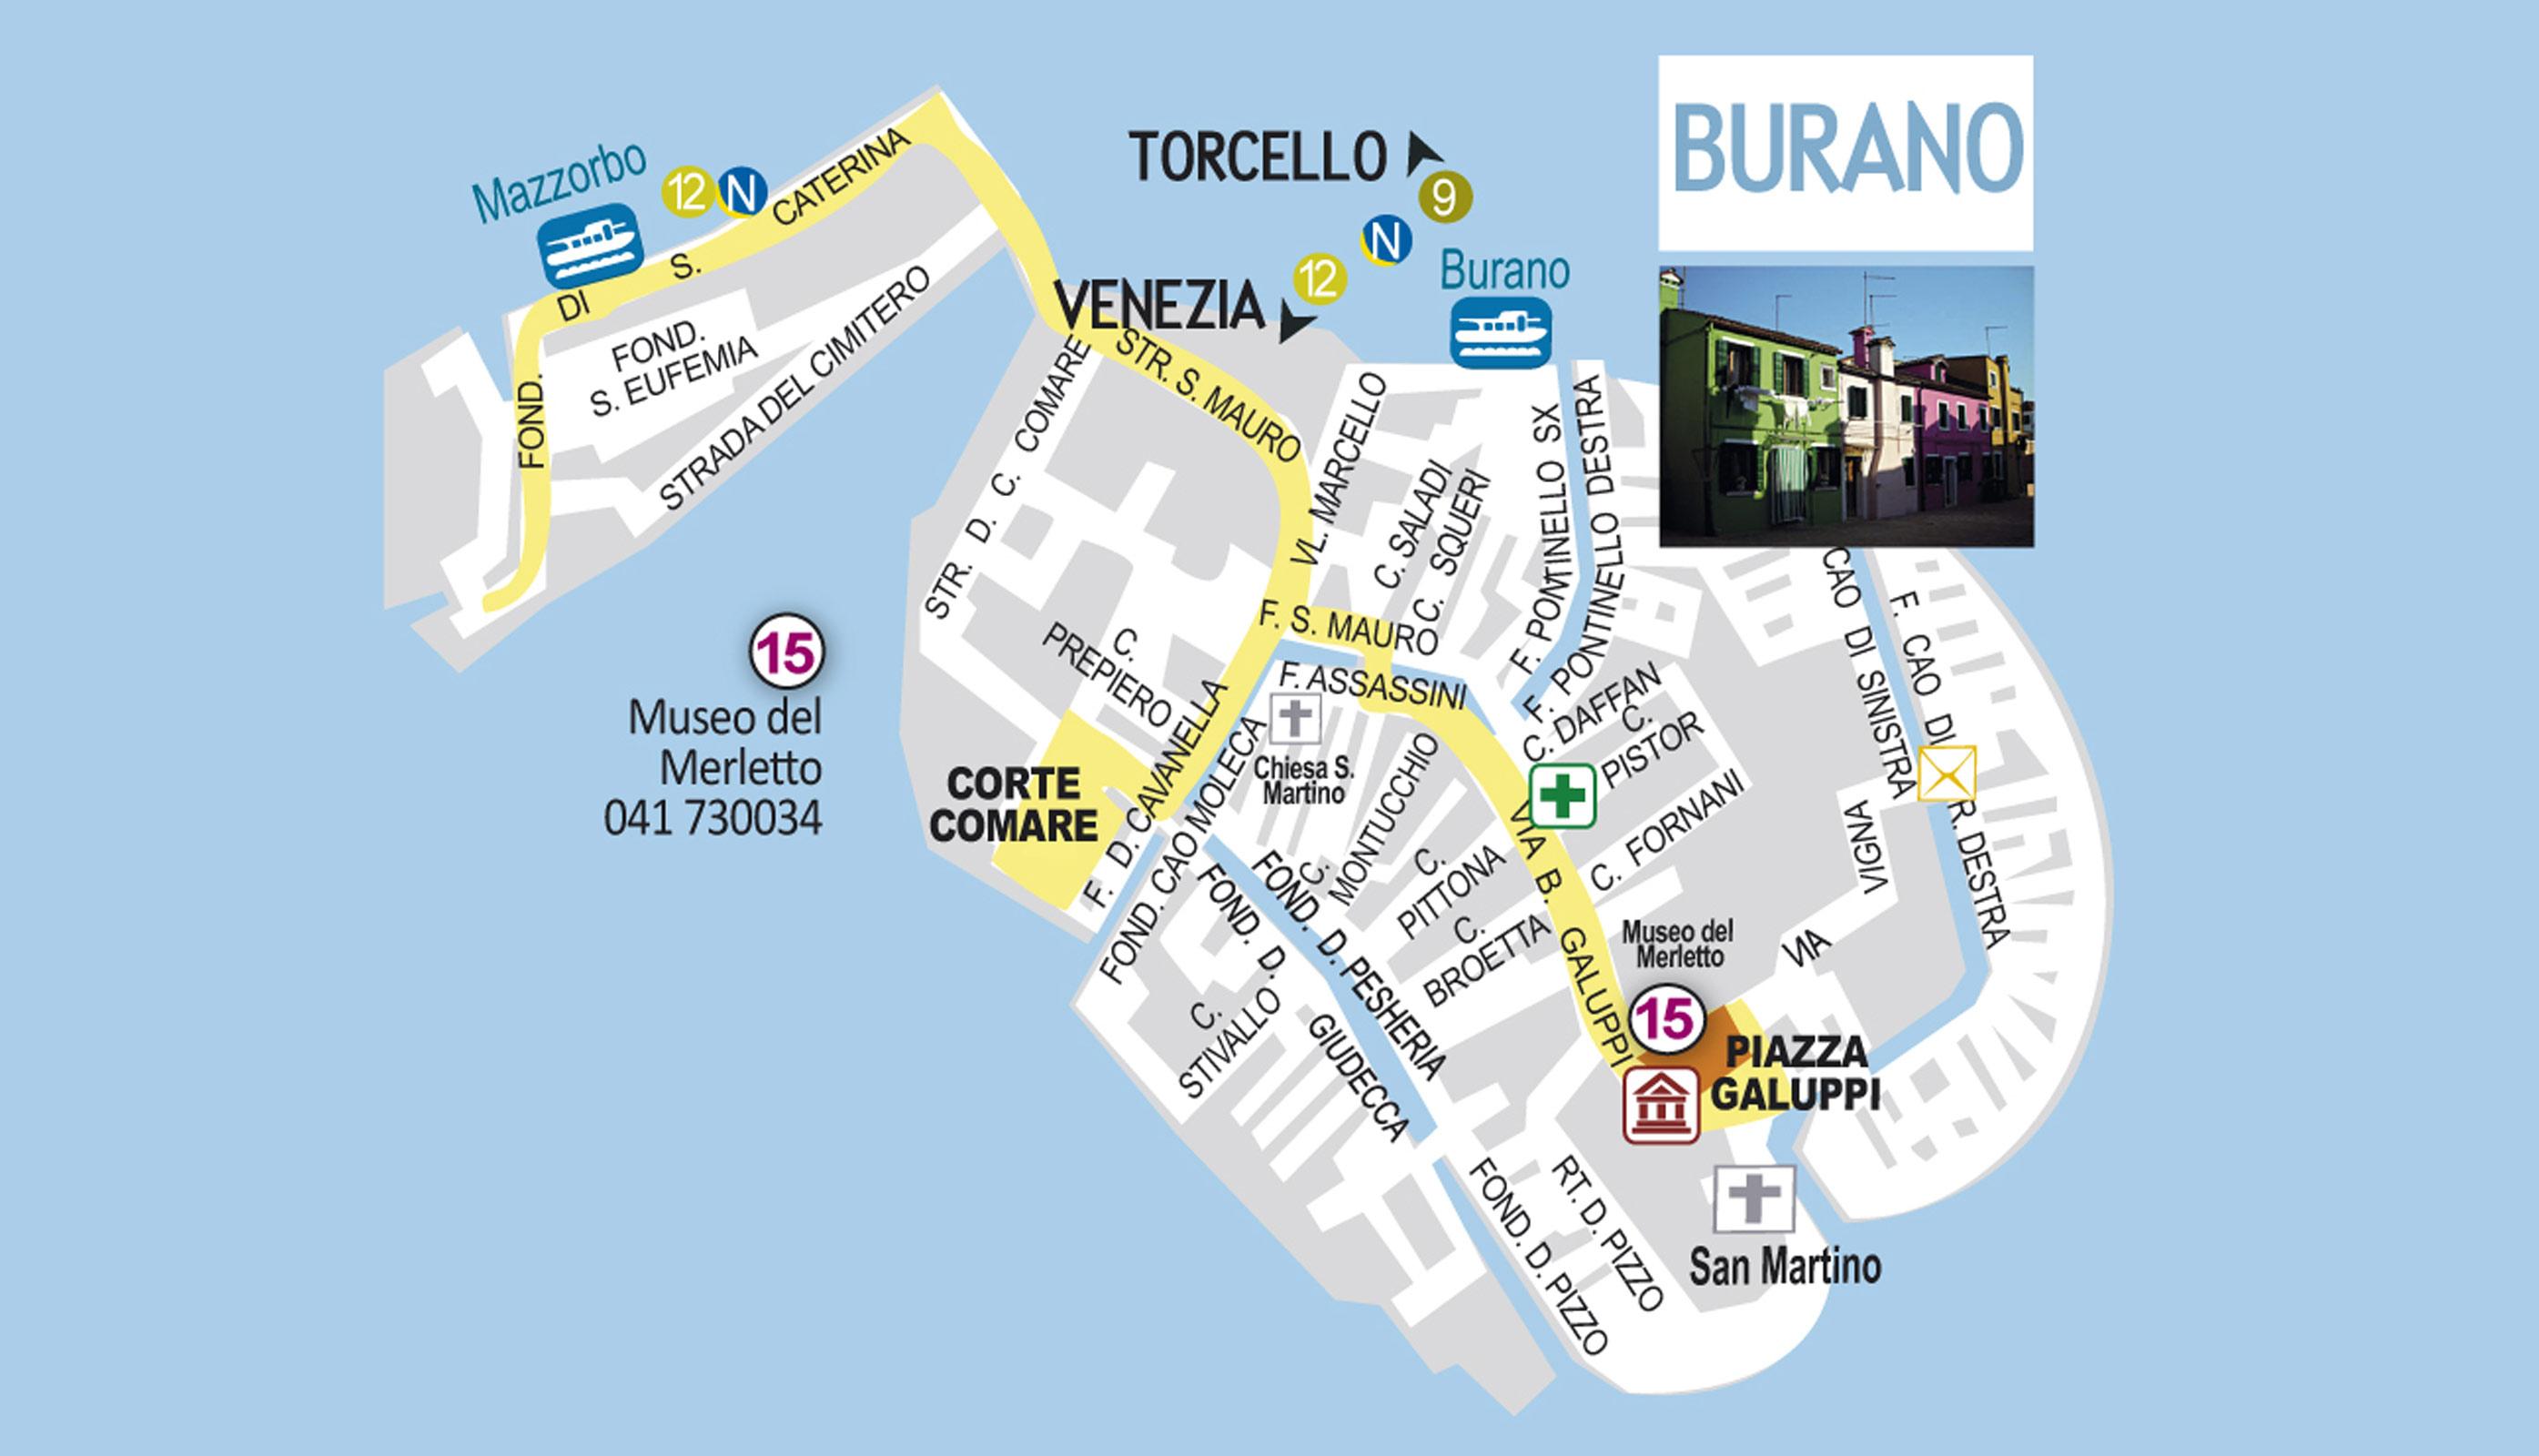 Burano A Splash Of Color In The Bleak Venetian Lagoon